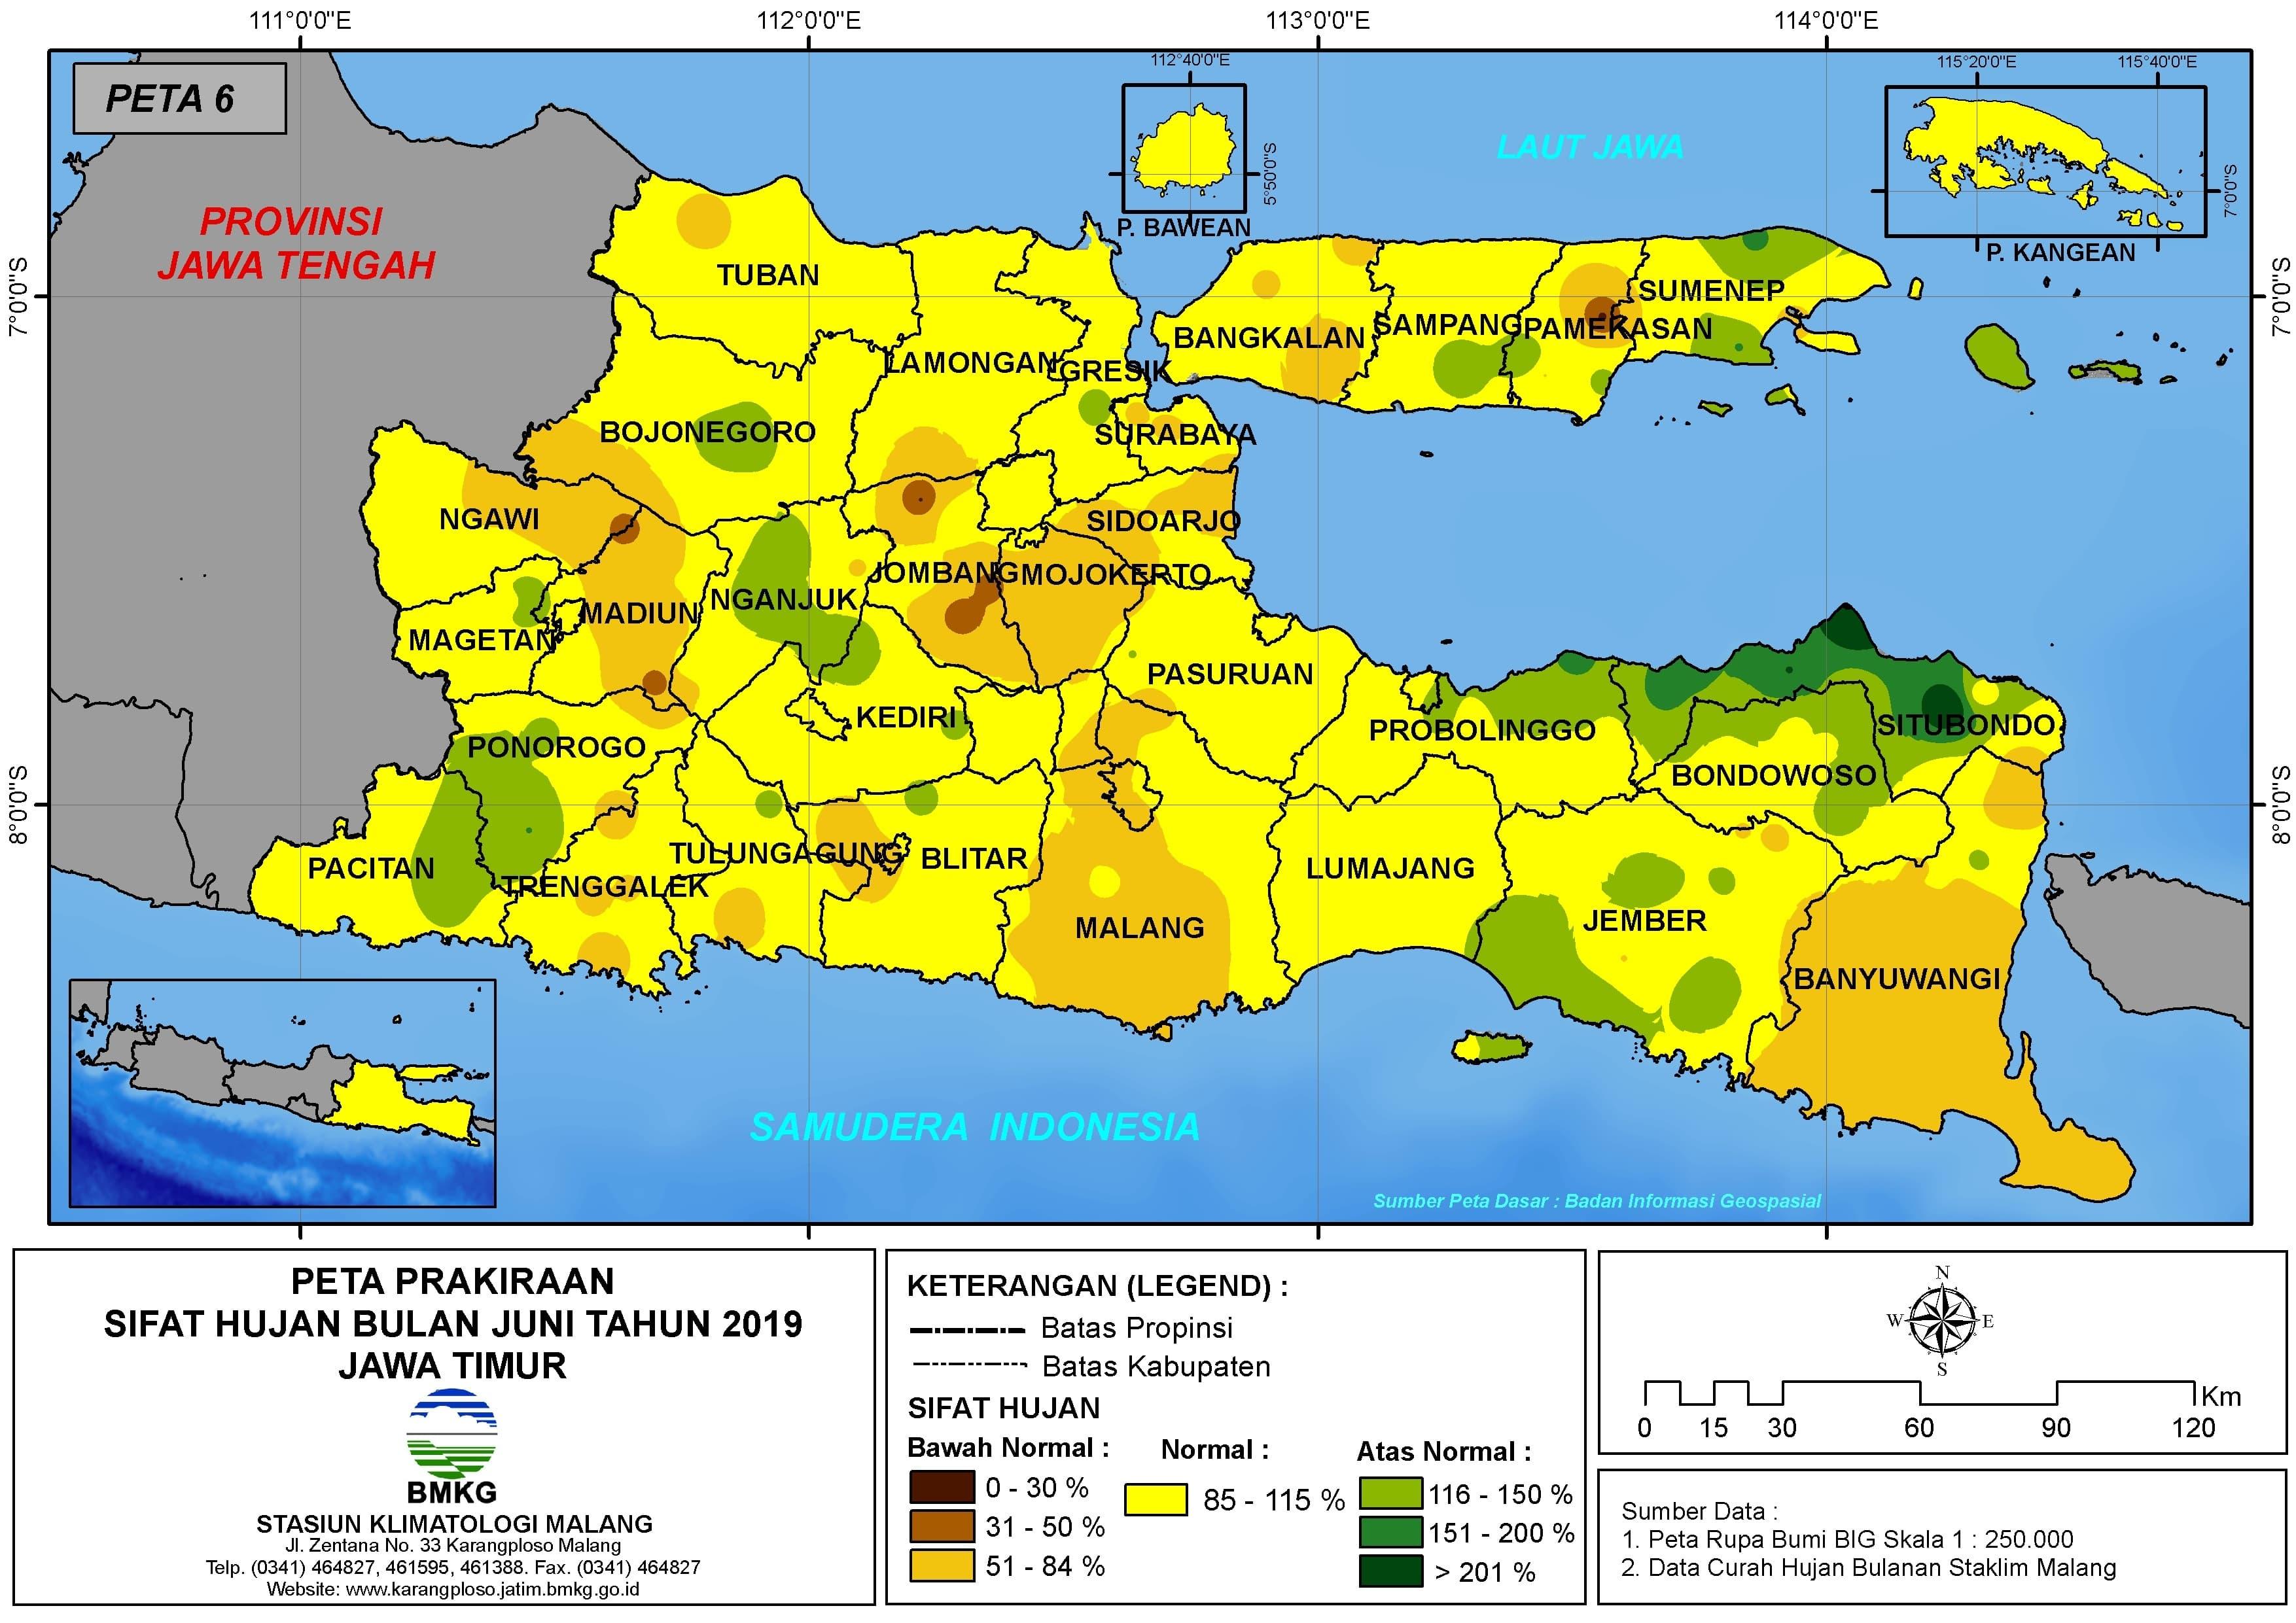 Peta Prakiraan-Bulanan Sifat Hujan Bulan JUNI Tahun 2019 di Provinsi Jawa Timur Update dari Analisis Bulan Maret 2019